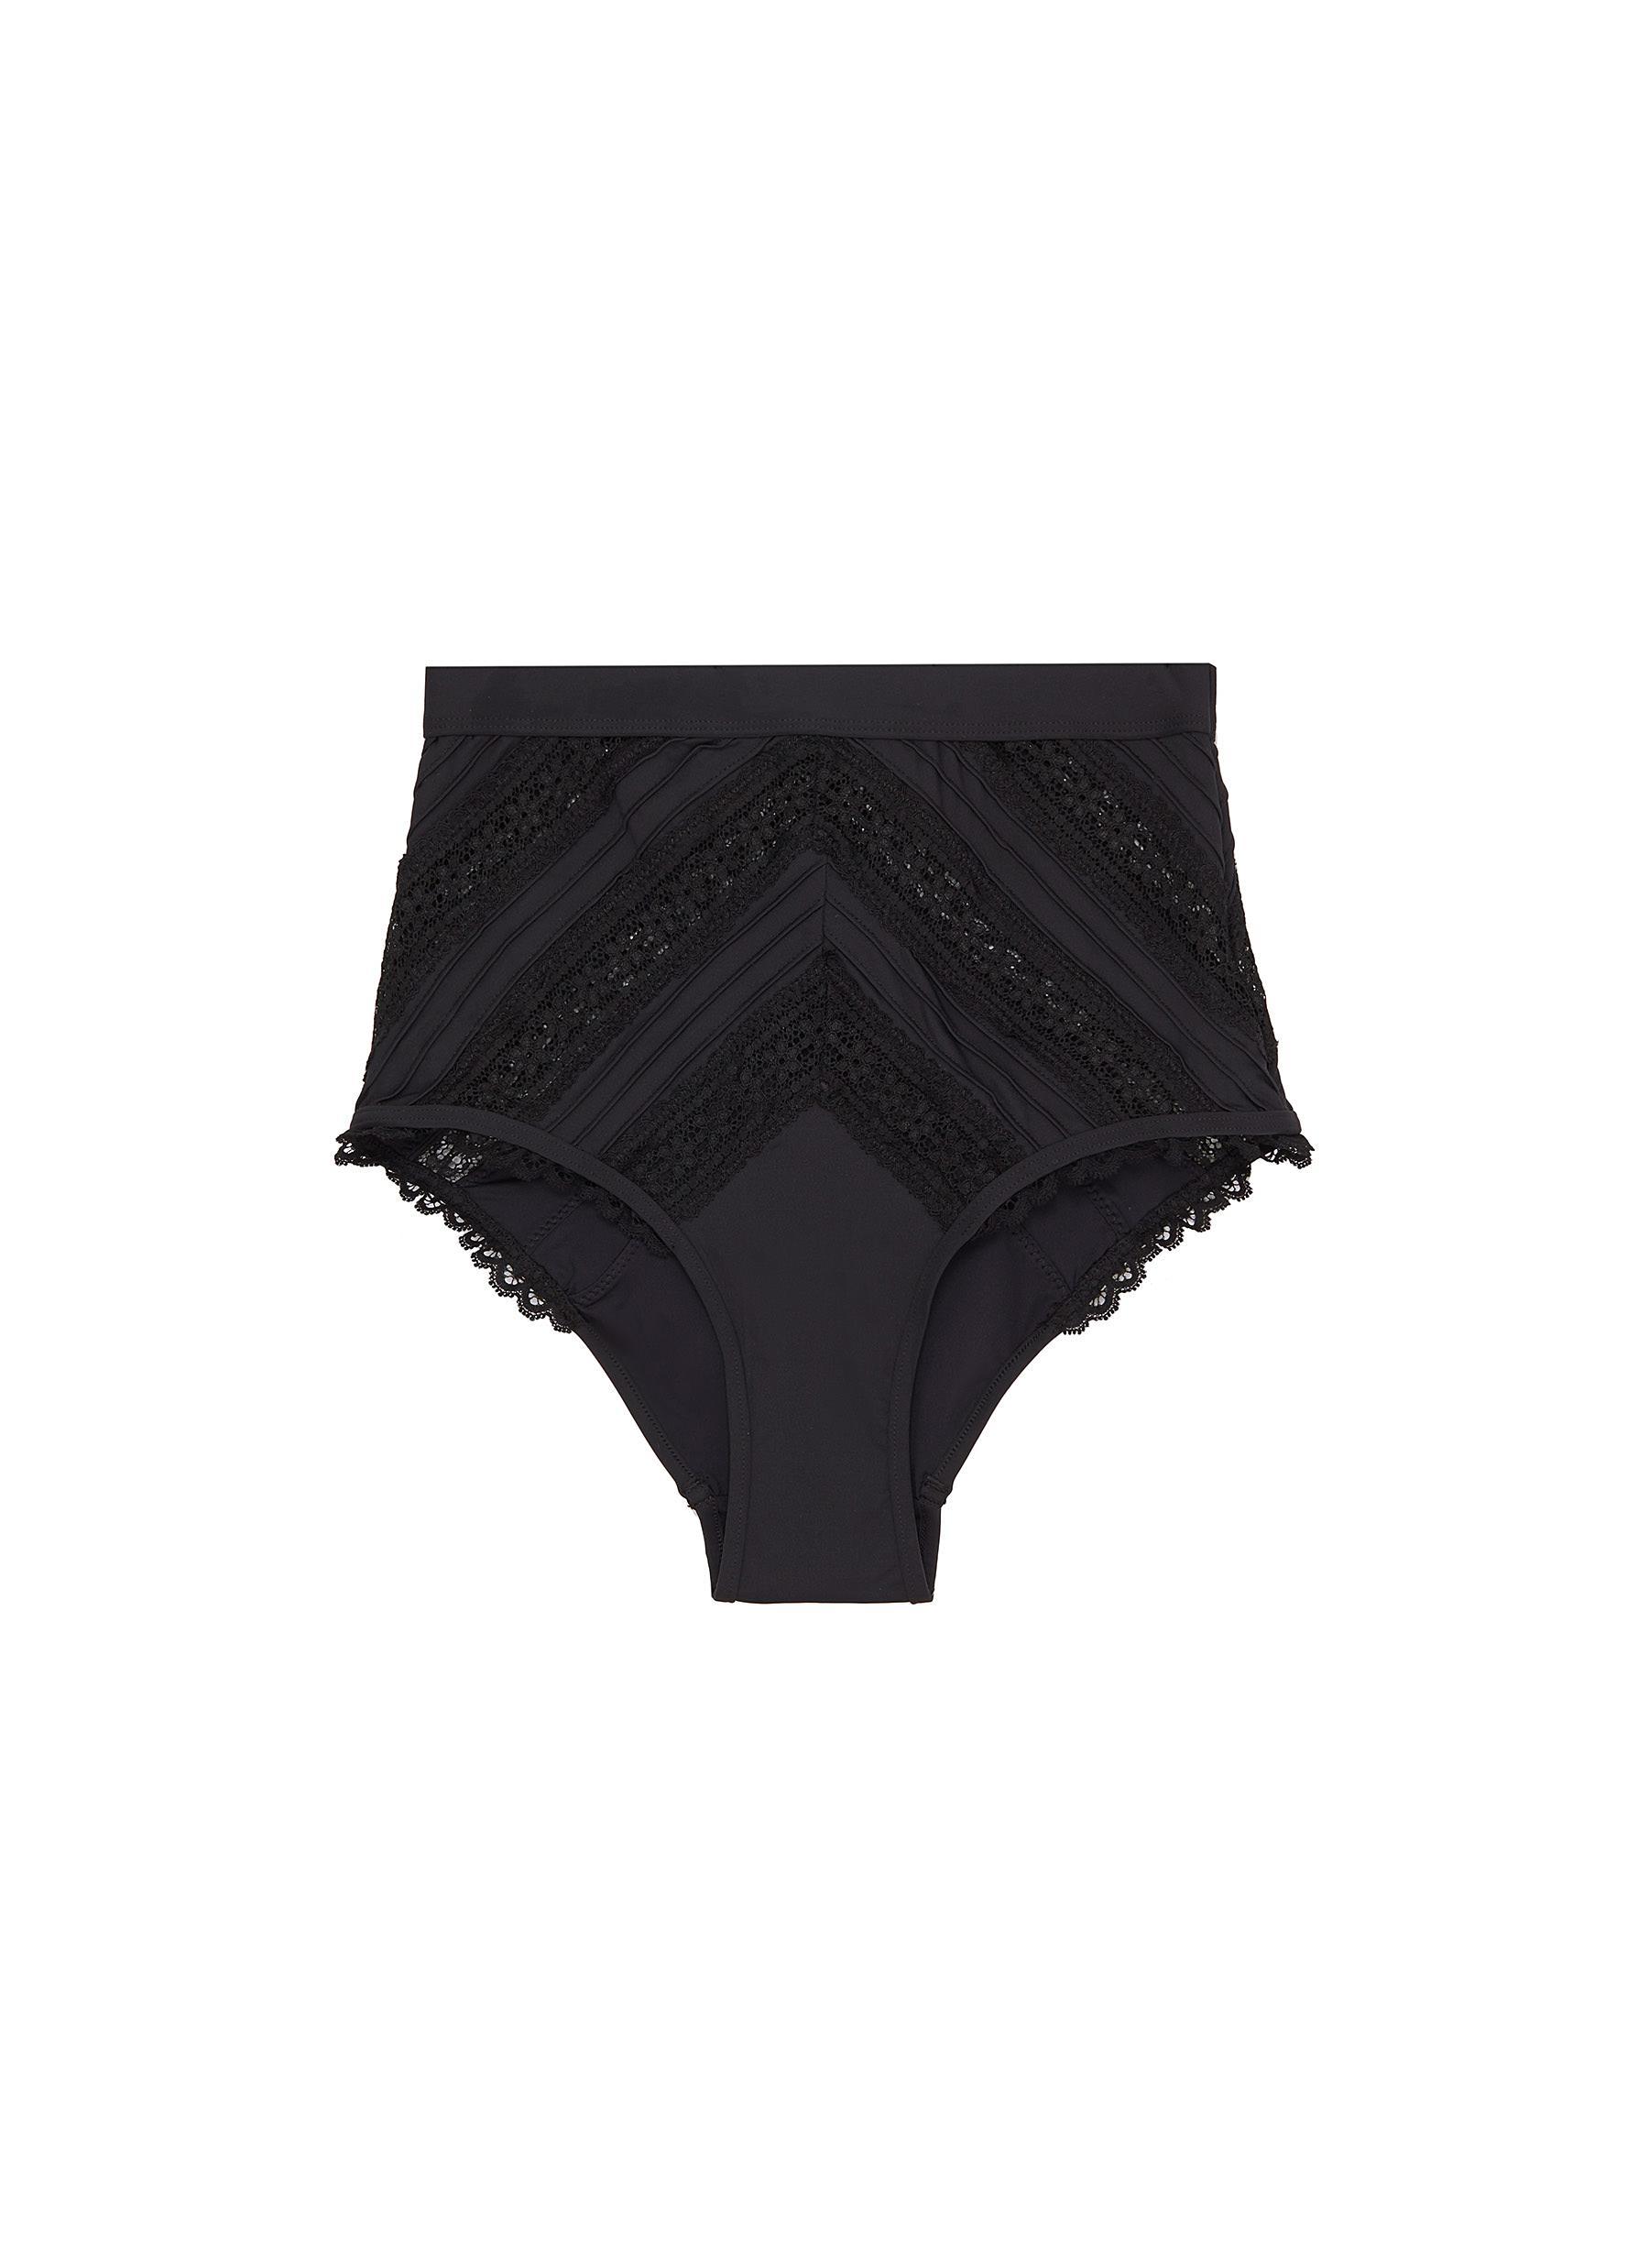 Heathers lace stripe high waist bikini bottoms by Zimmermann